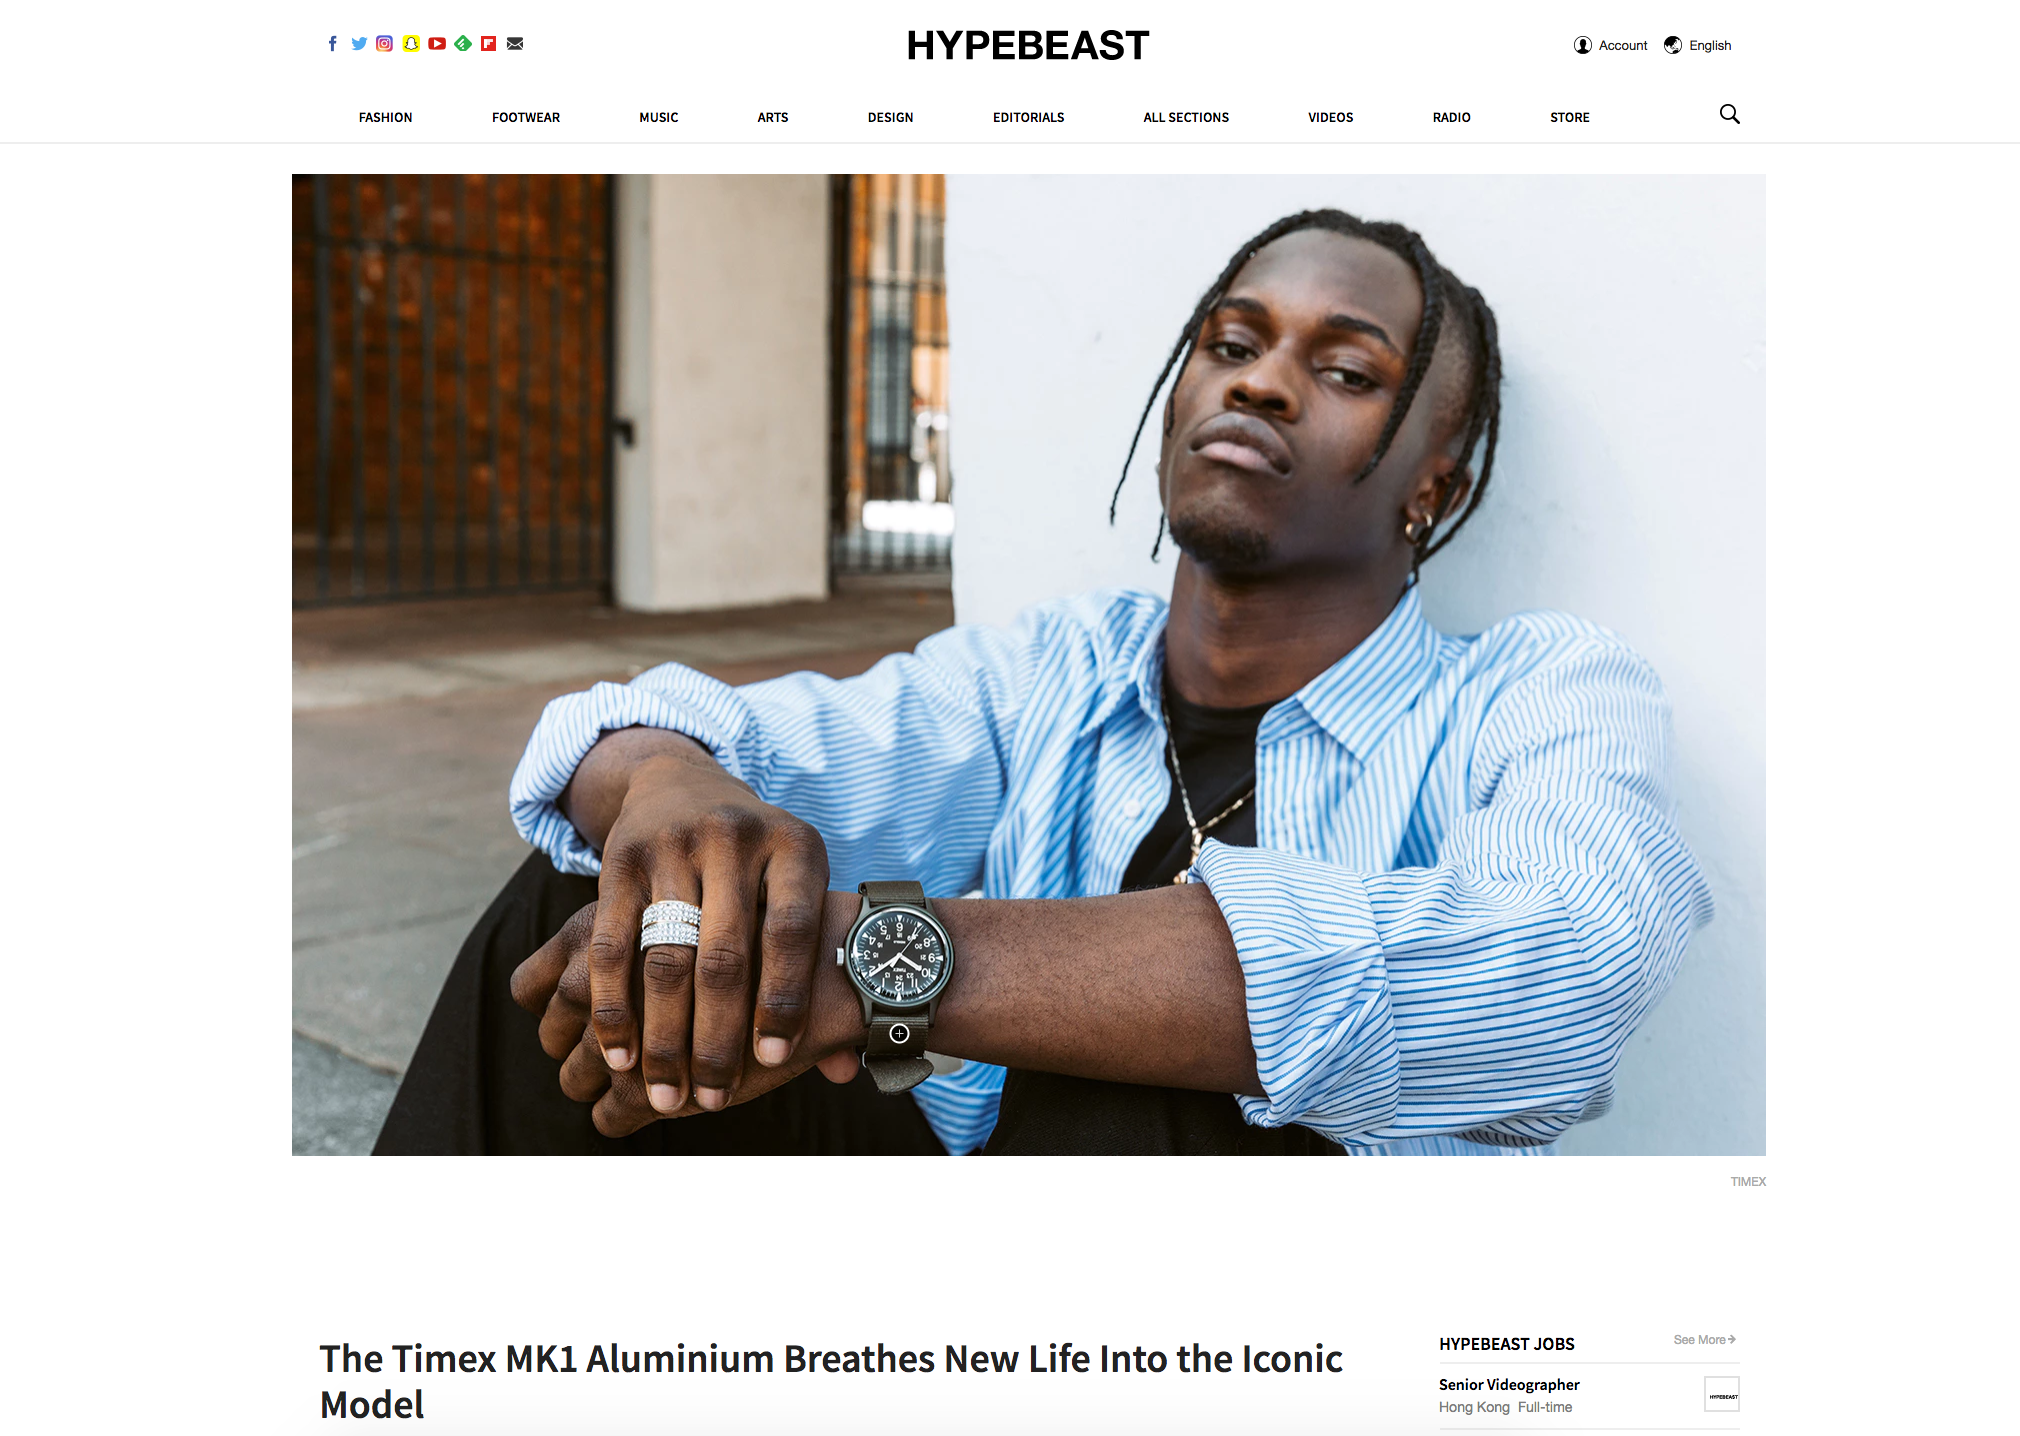 Hypebeast feature